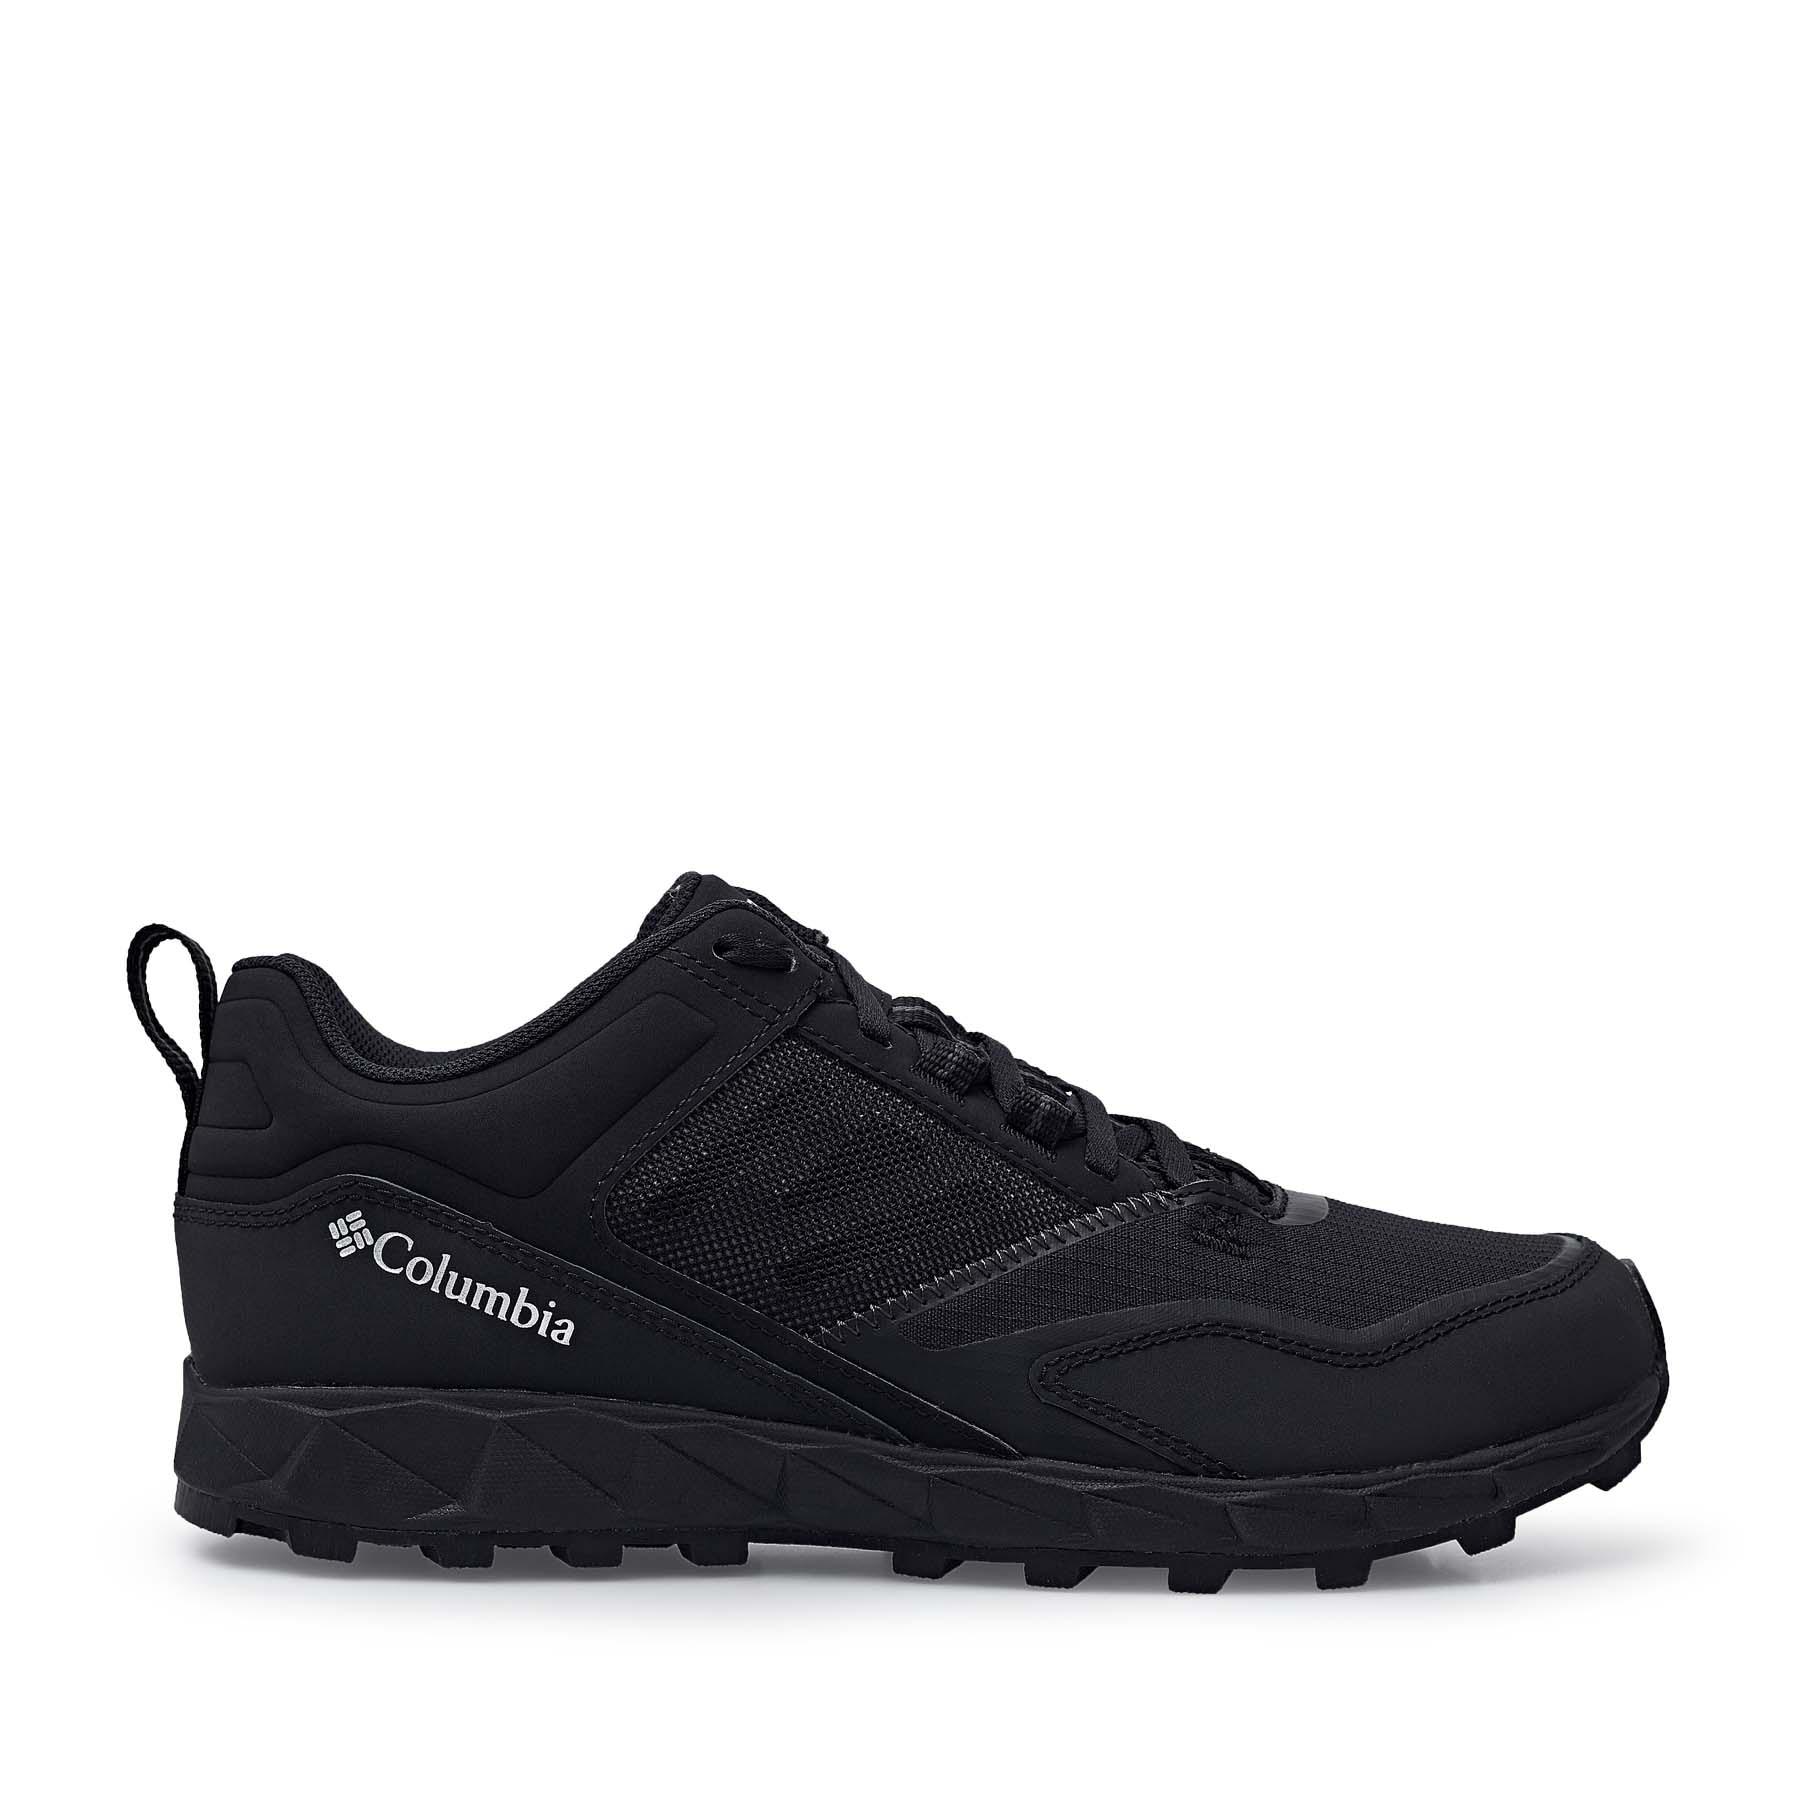 Colombia-zapatillas De Deporte Para Hombre, Zapatos Masculinos Para Exteriores, BM0164